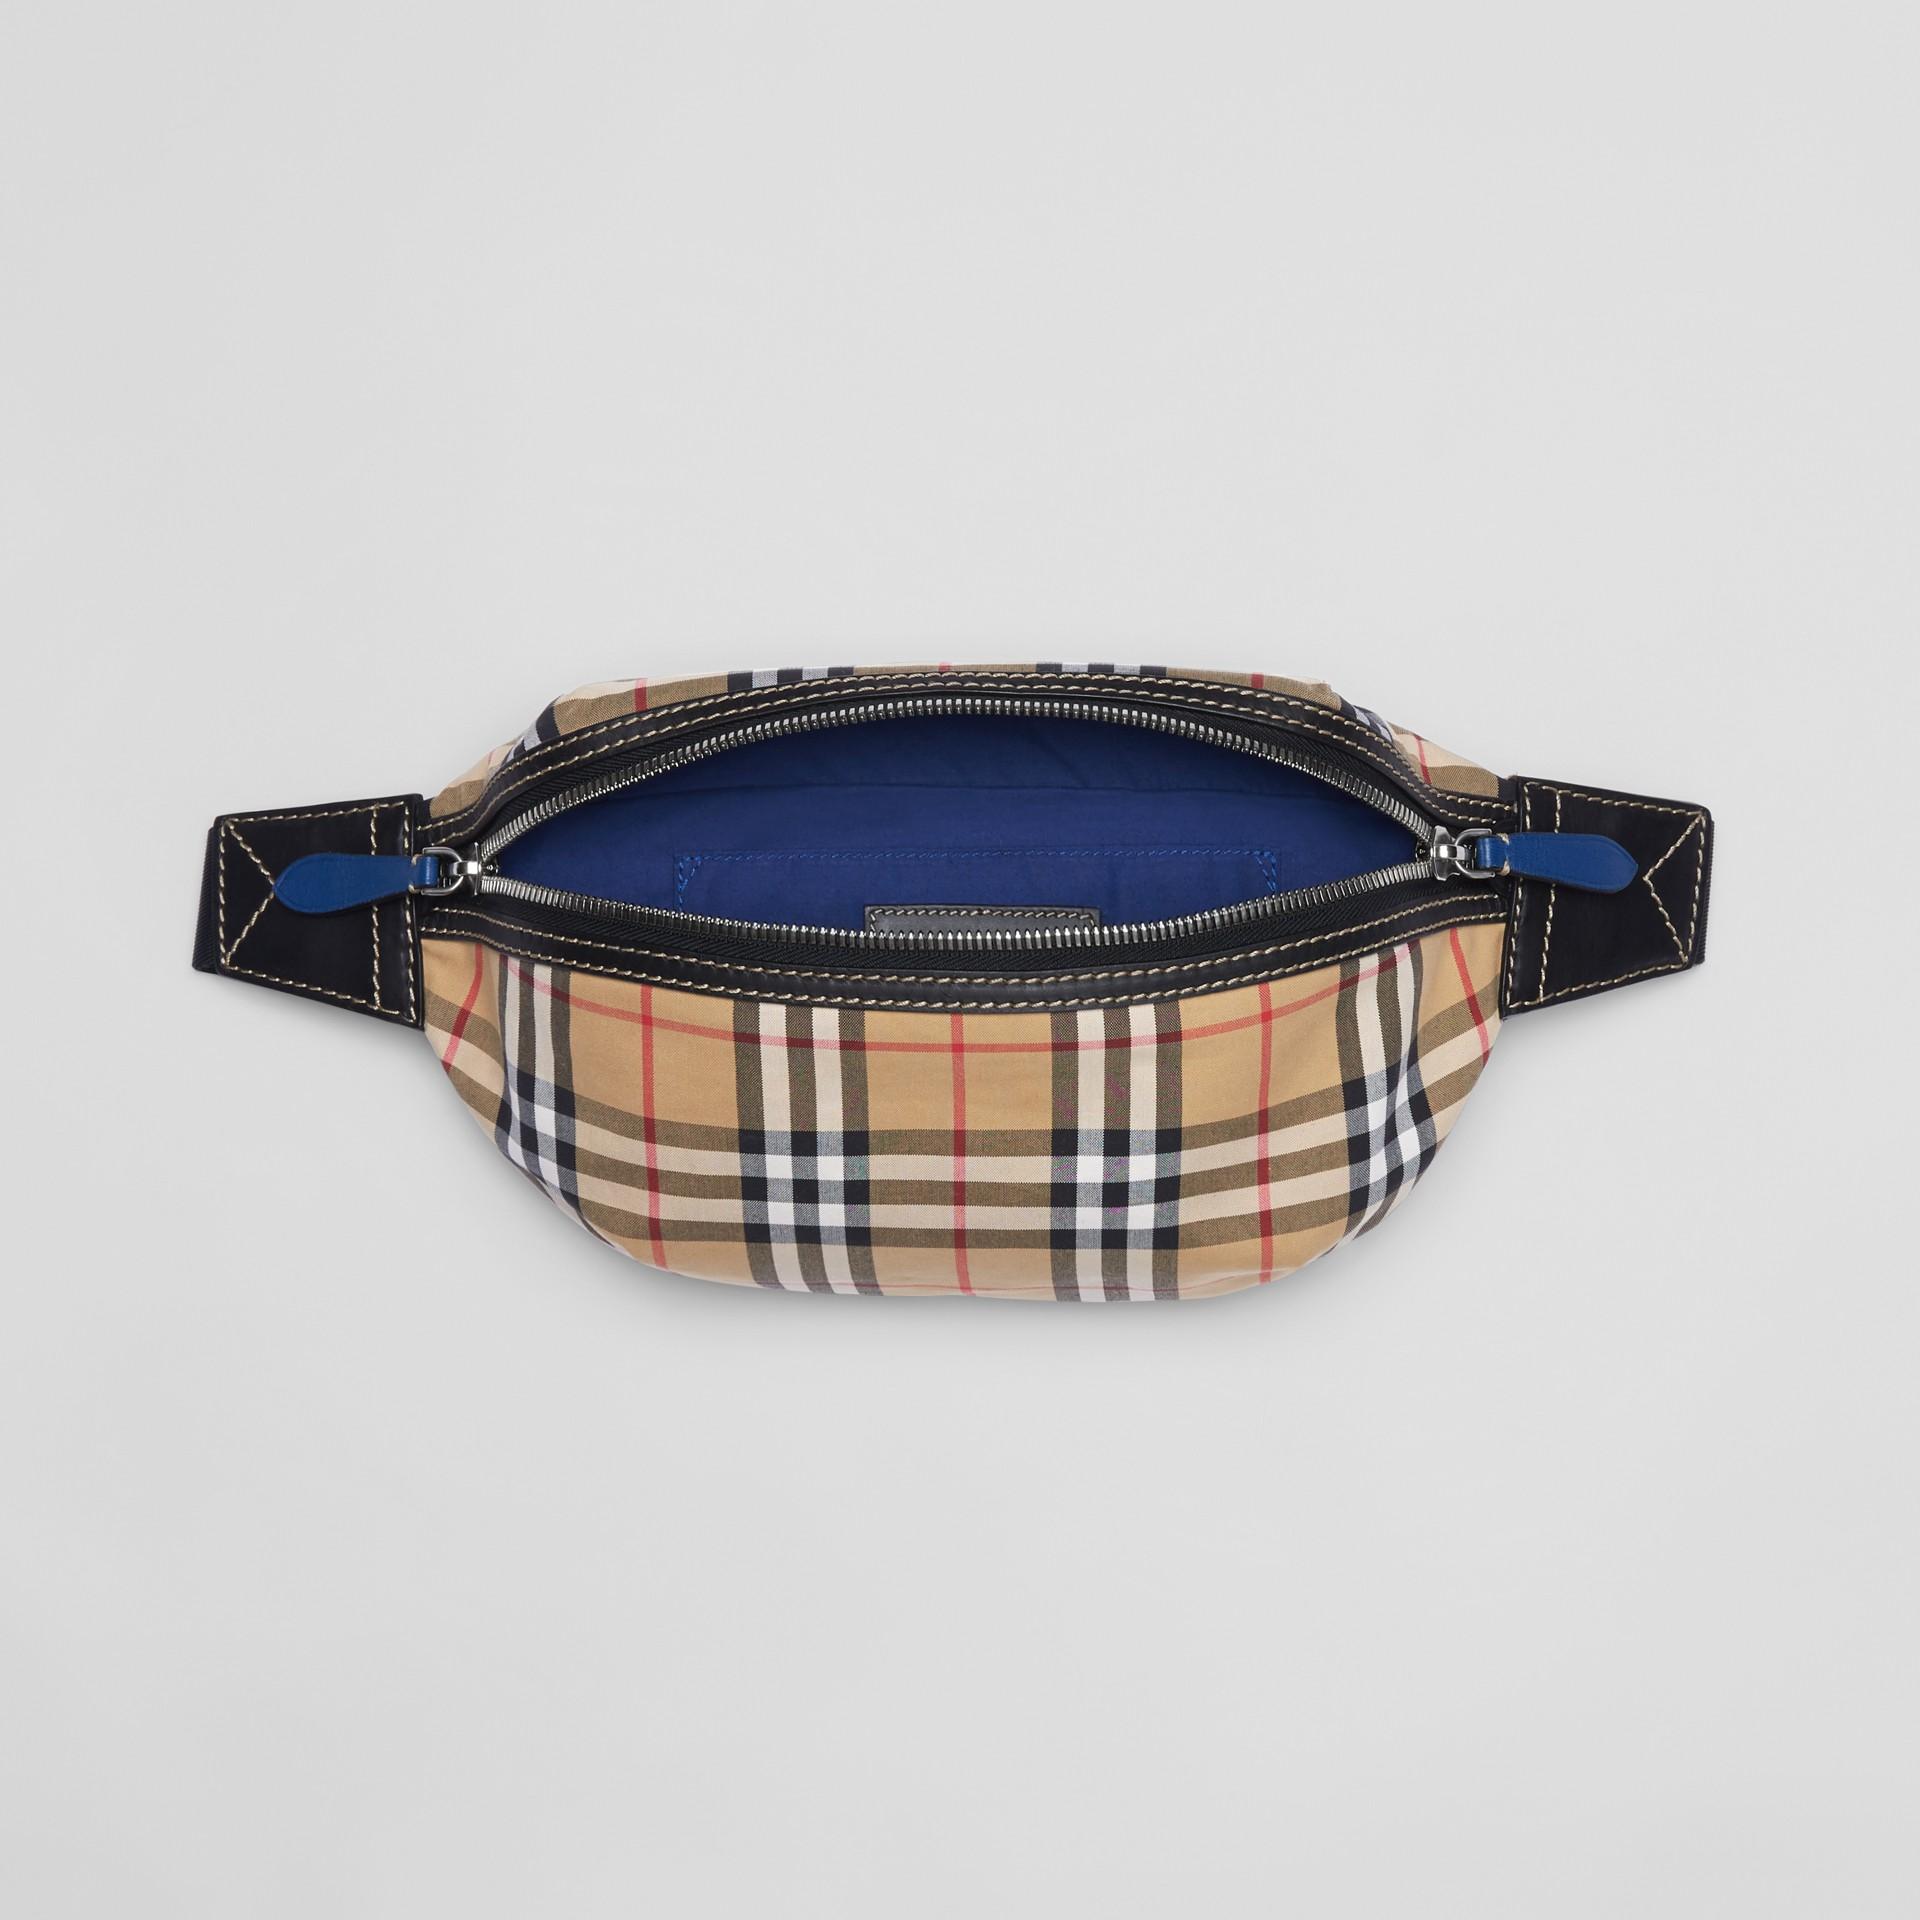 Medium Vintage Check Bum Bag in Canvas Blue - Men | Burberry - gallery image 5